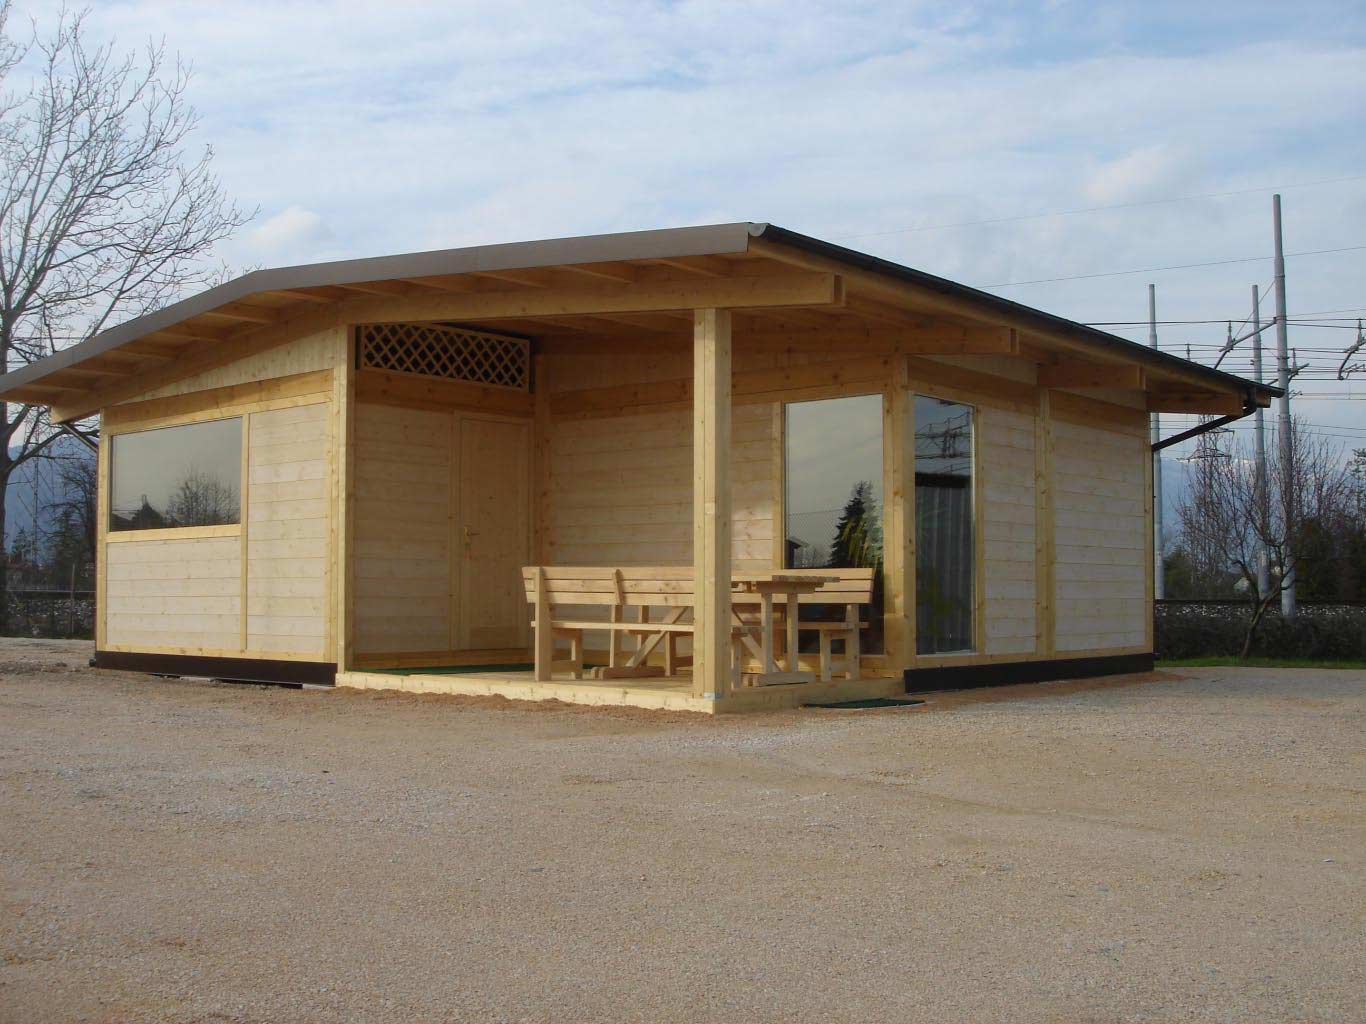 case prefabbricate in legno 004 case prefabbricate in legno 005